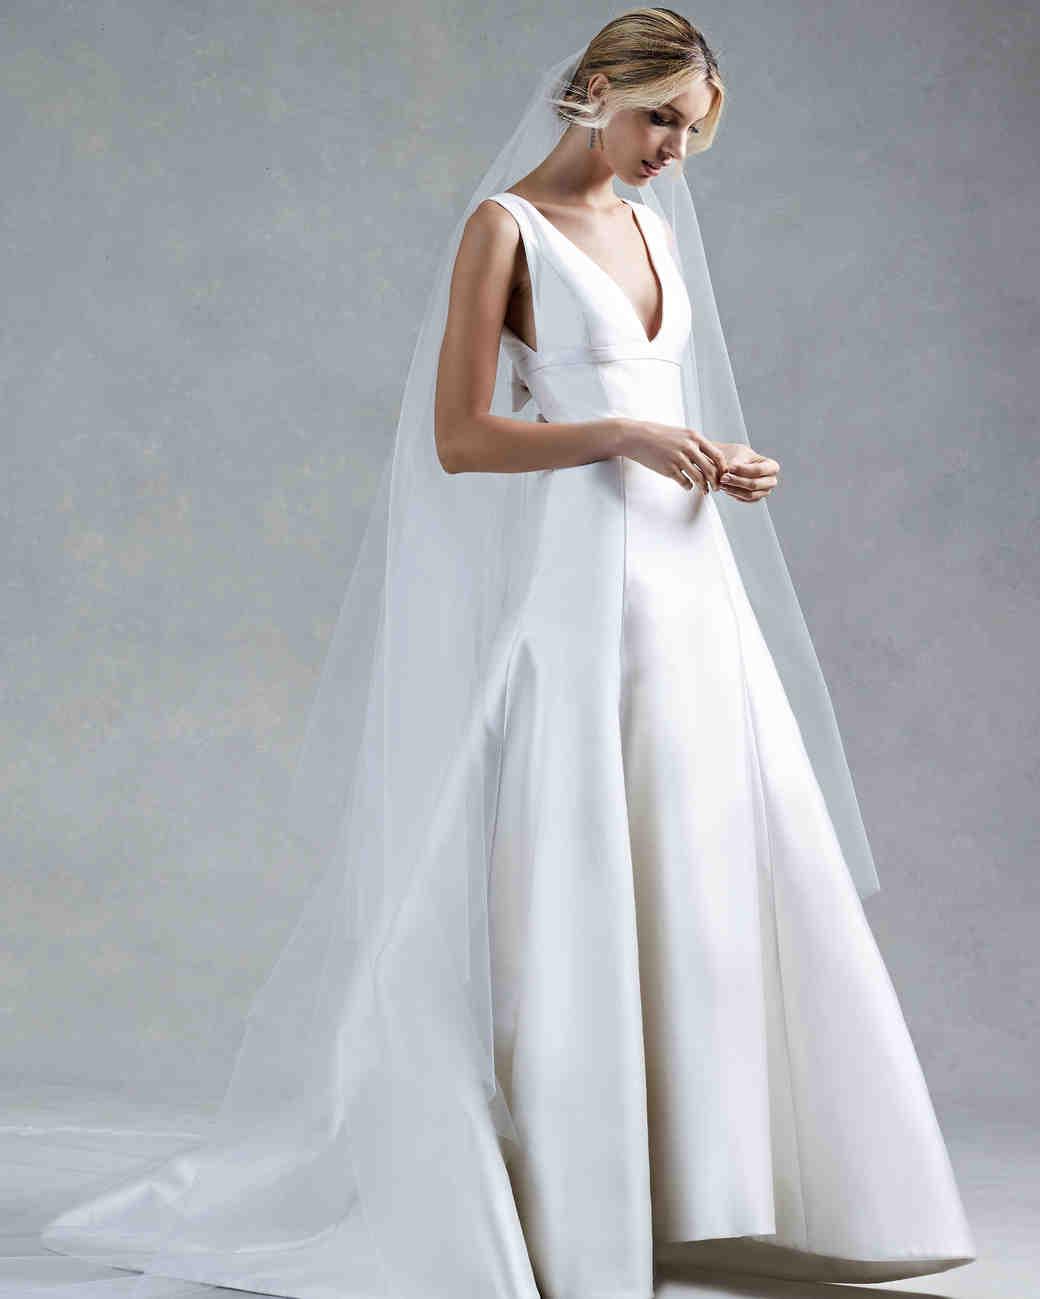 Oscar de la renta fall 2017 wedding dress collection for De la renta wedding dresses